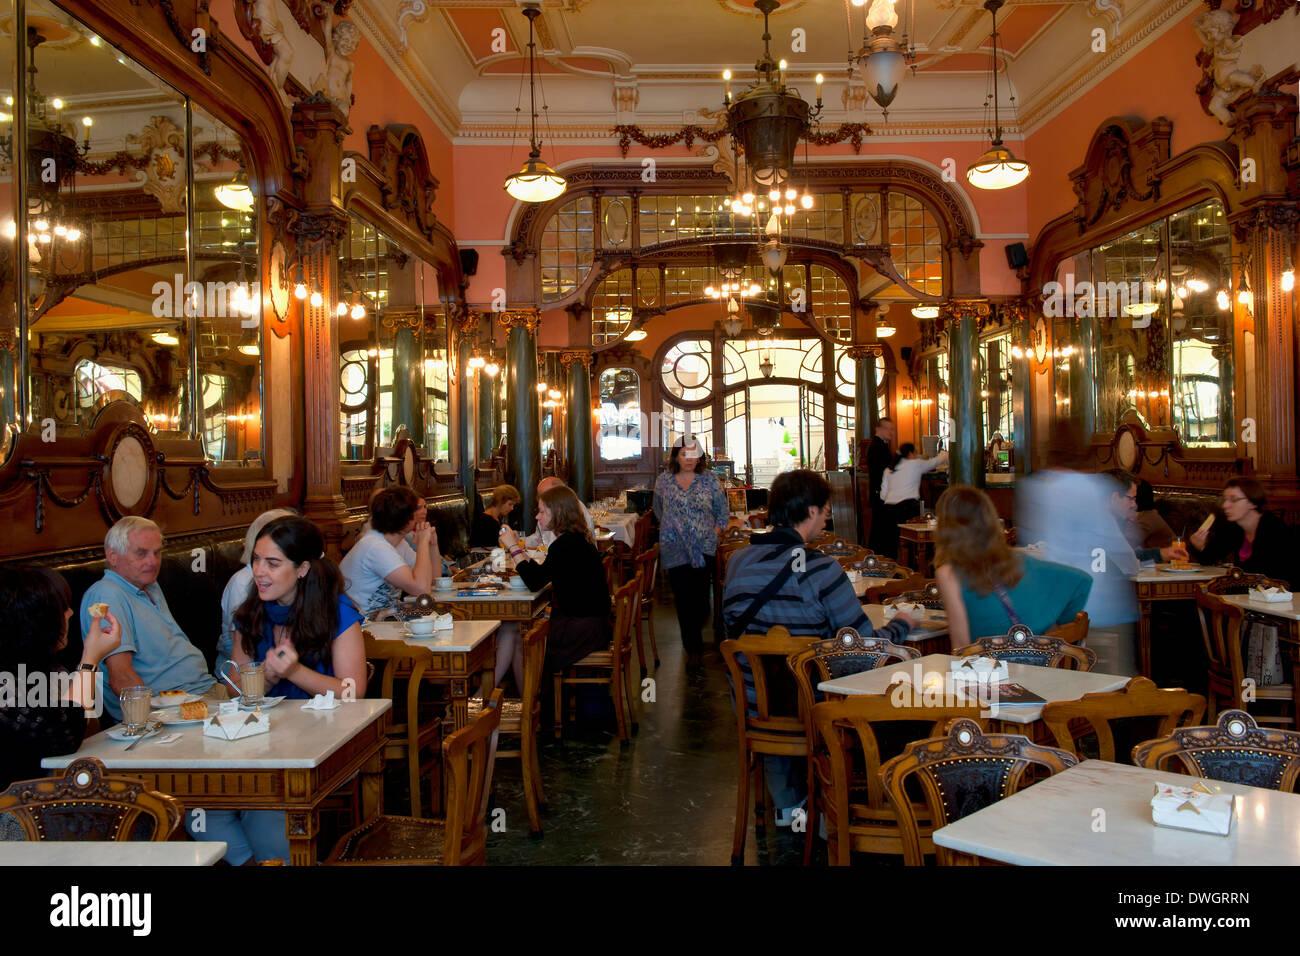 Majestic Cafe, Porto - Stock Image